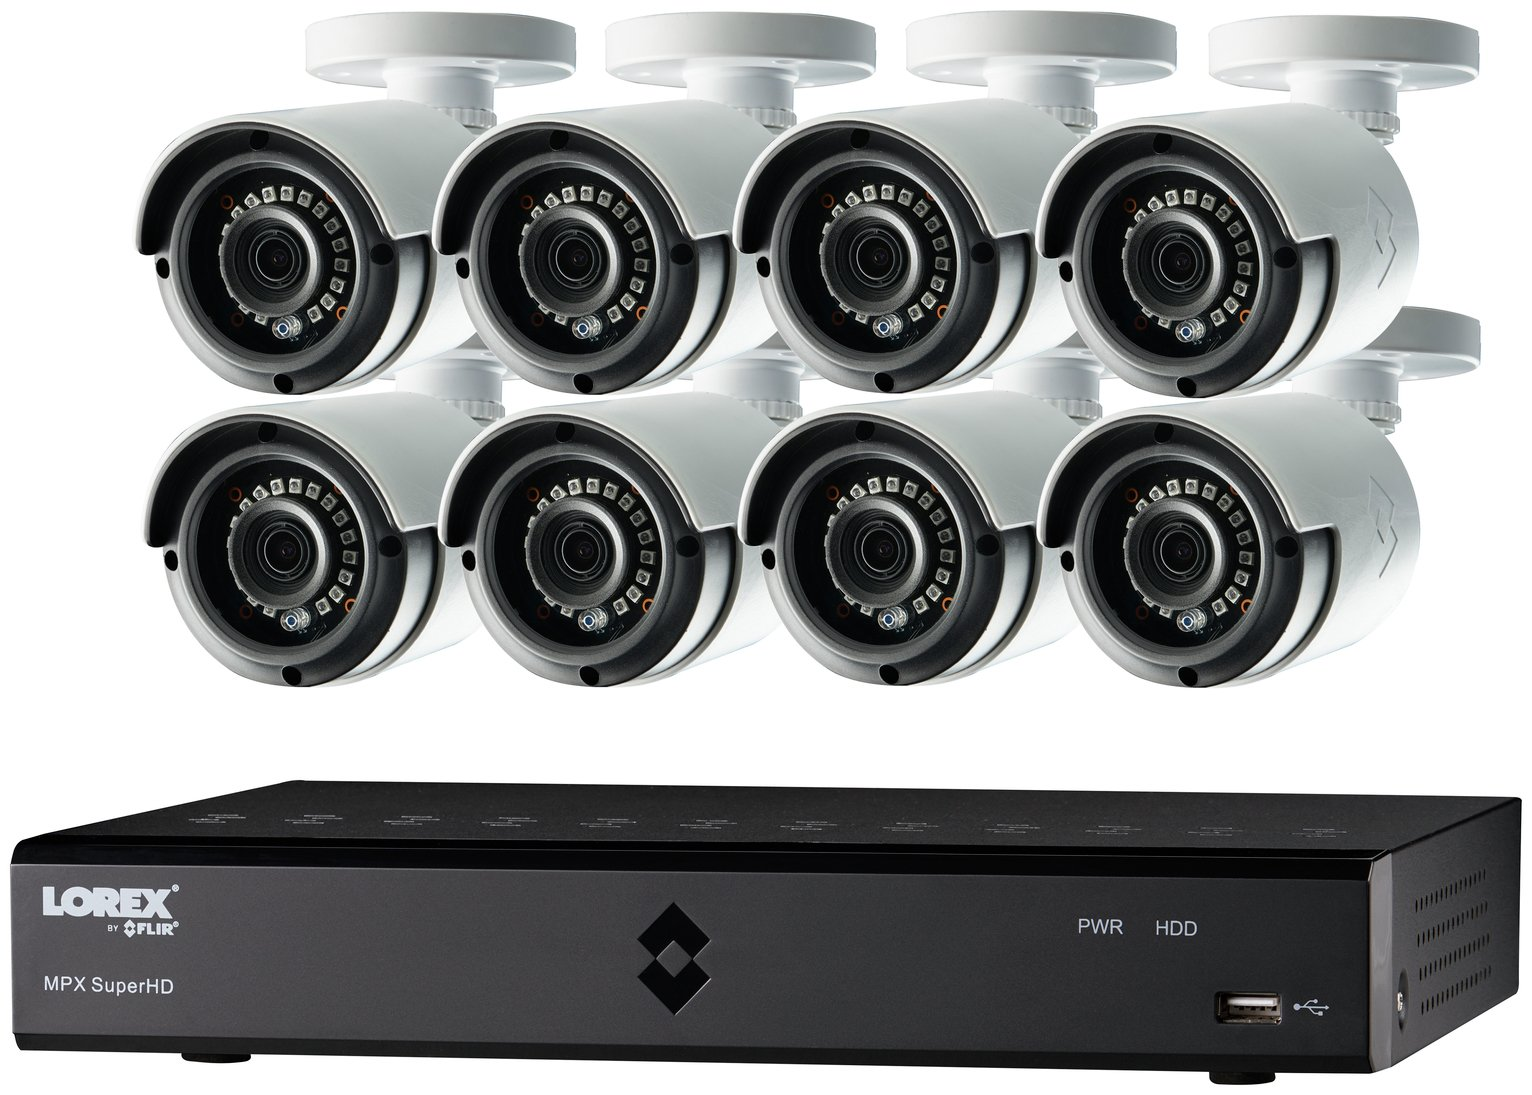 Image of Lorex 16 Channel 1080P 2TB DVR and 8 Camera CCTV